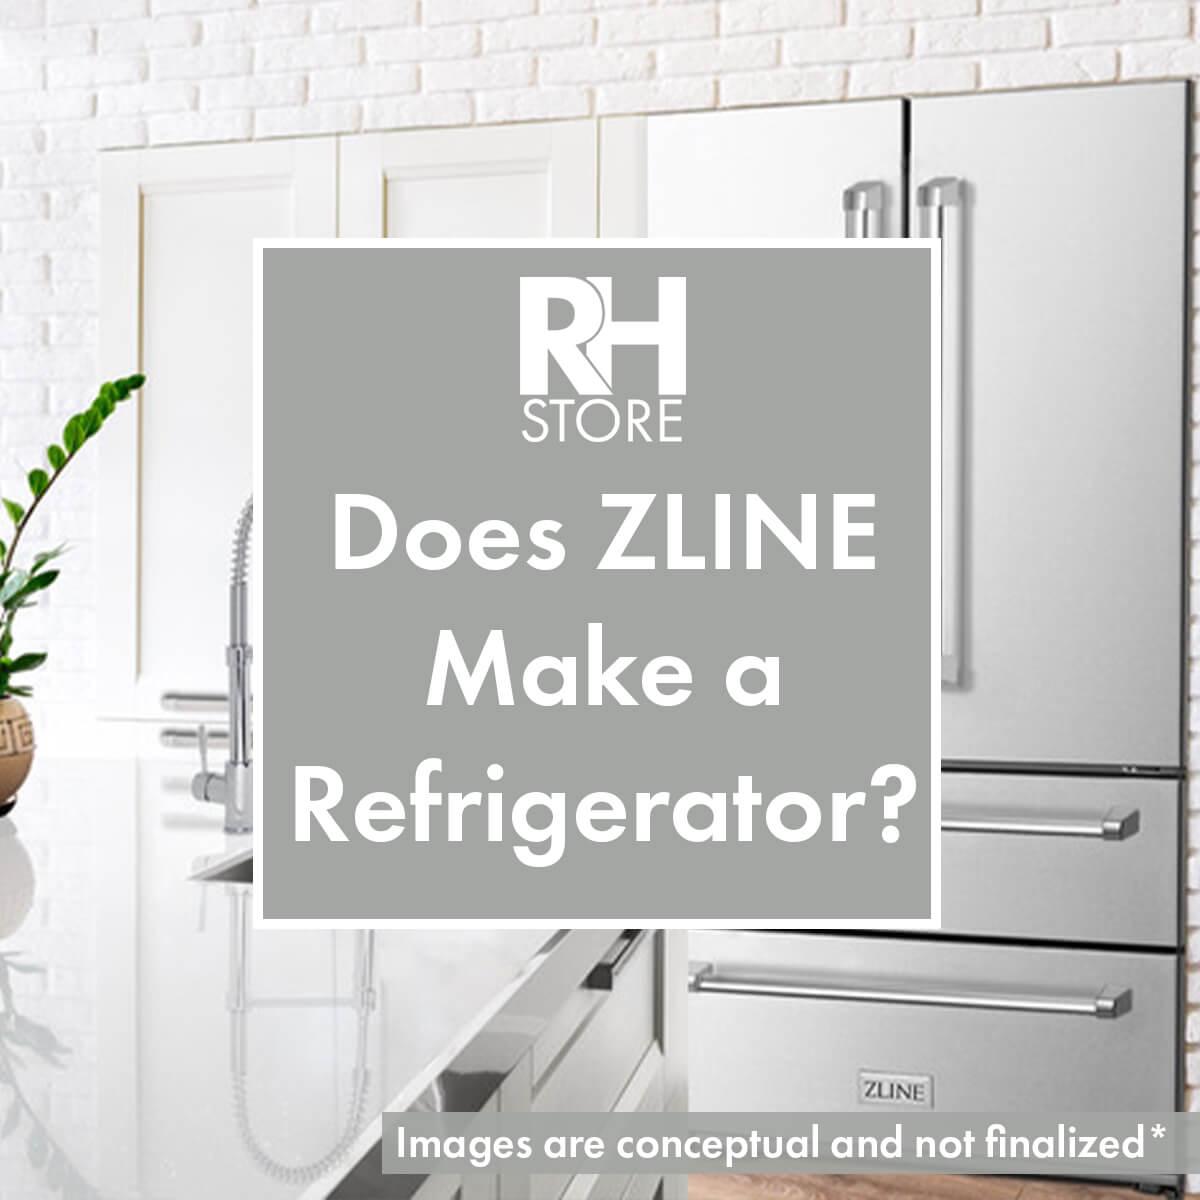 ZLINE Refrigerators - Does ZLINE Make a Refrigerator?